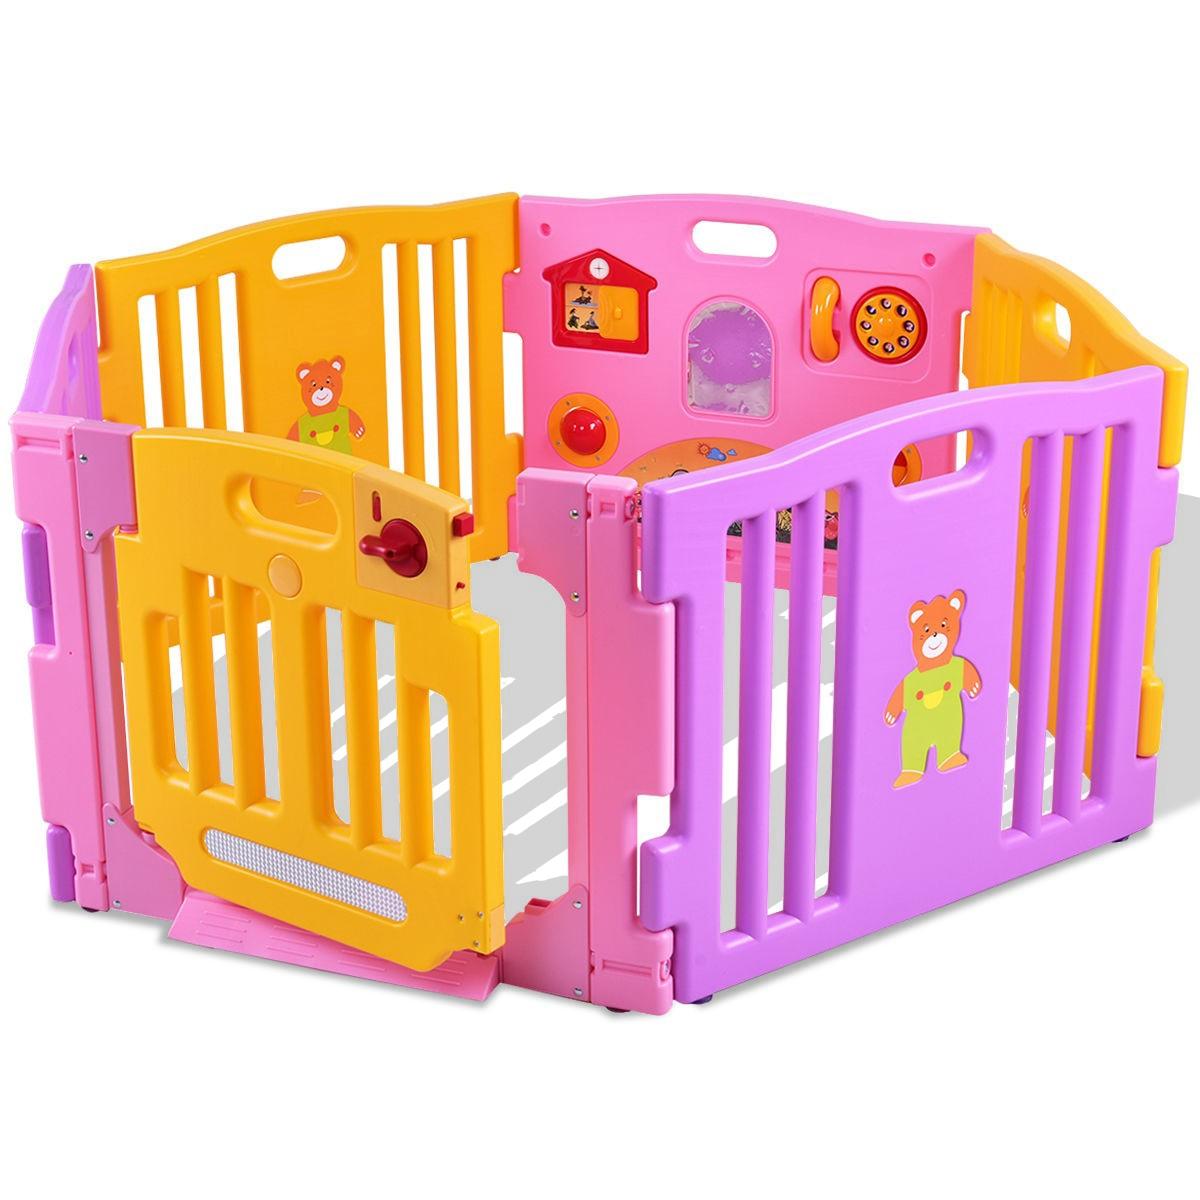 6 Panel Baby Playpen Kids Safety Play Center Yard